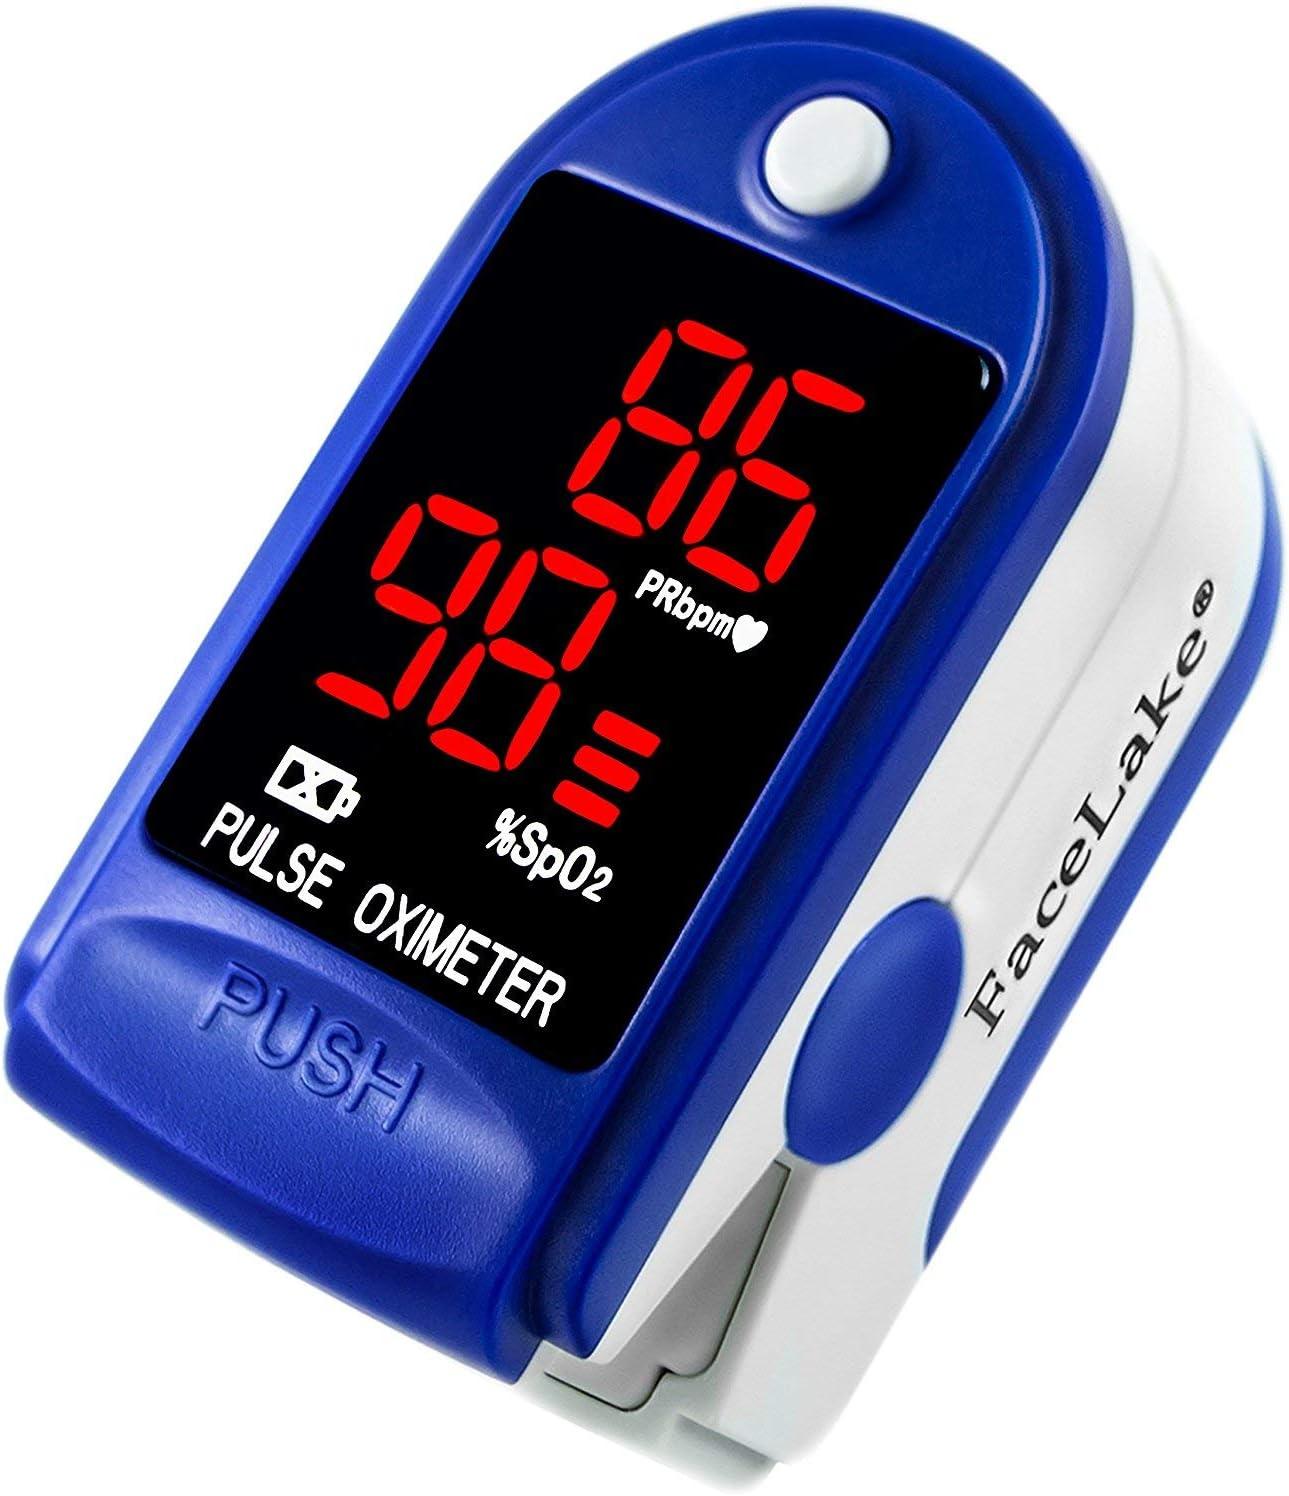 FaceLake  FL400 Pulse Oximeter Fingertip with Carrying Case Batteries Lanyard and Warranty Blue